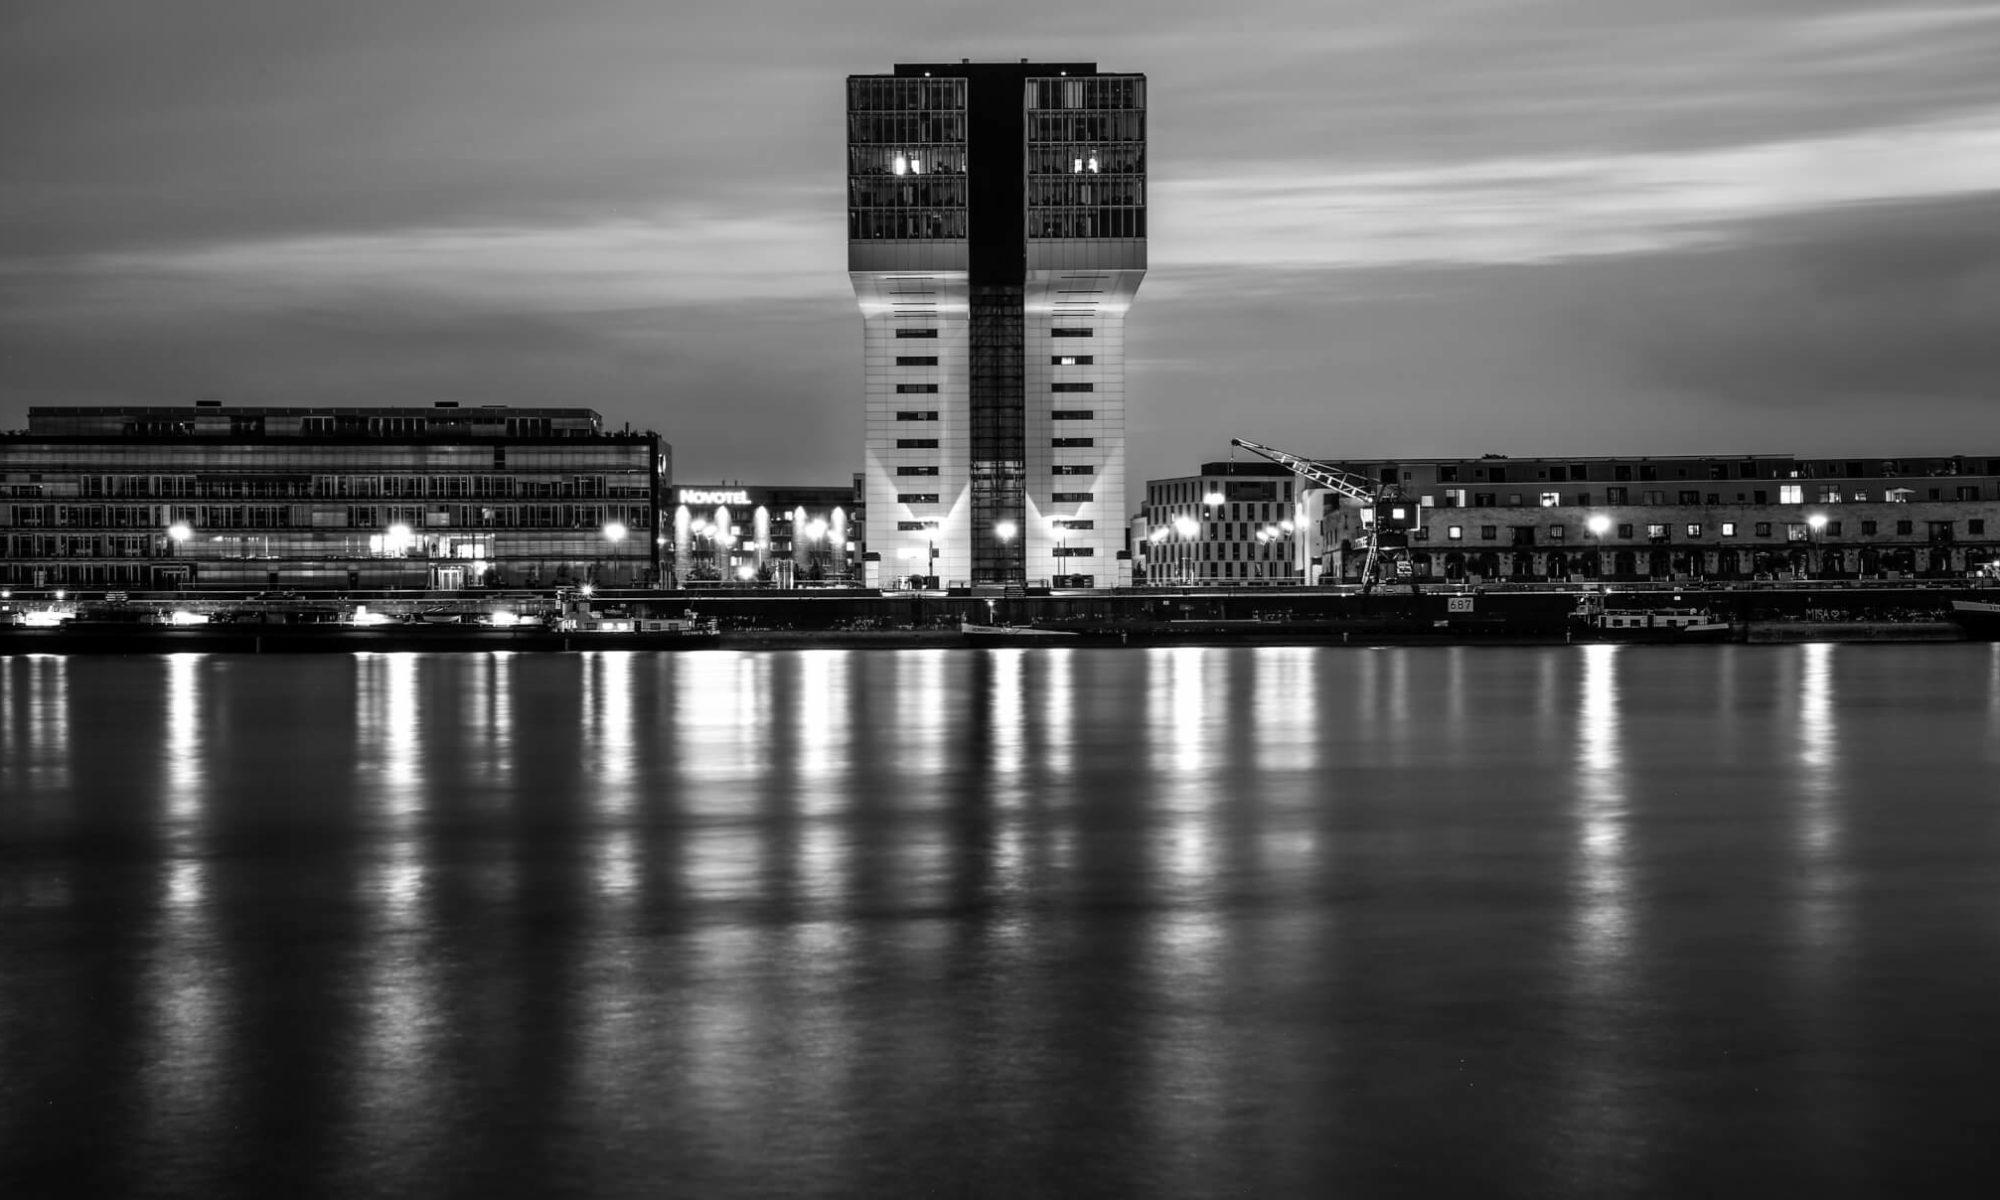 Photolodge | Fotoworkshop | Fotokurs | Köln